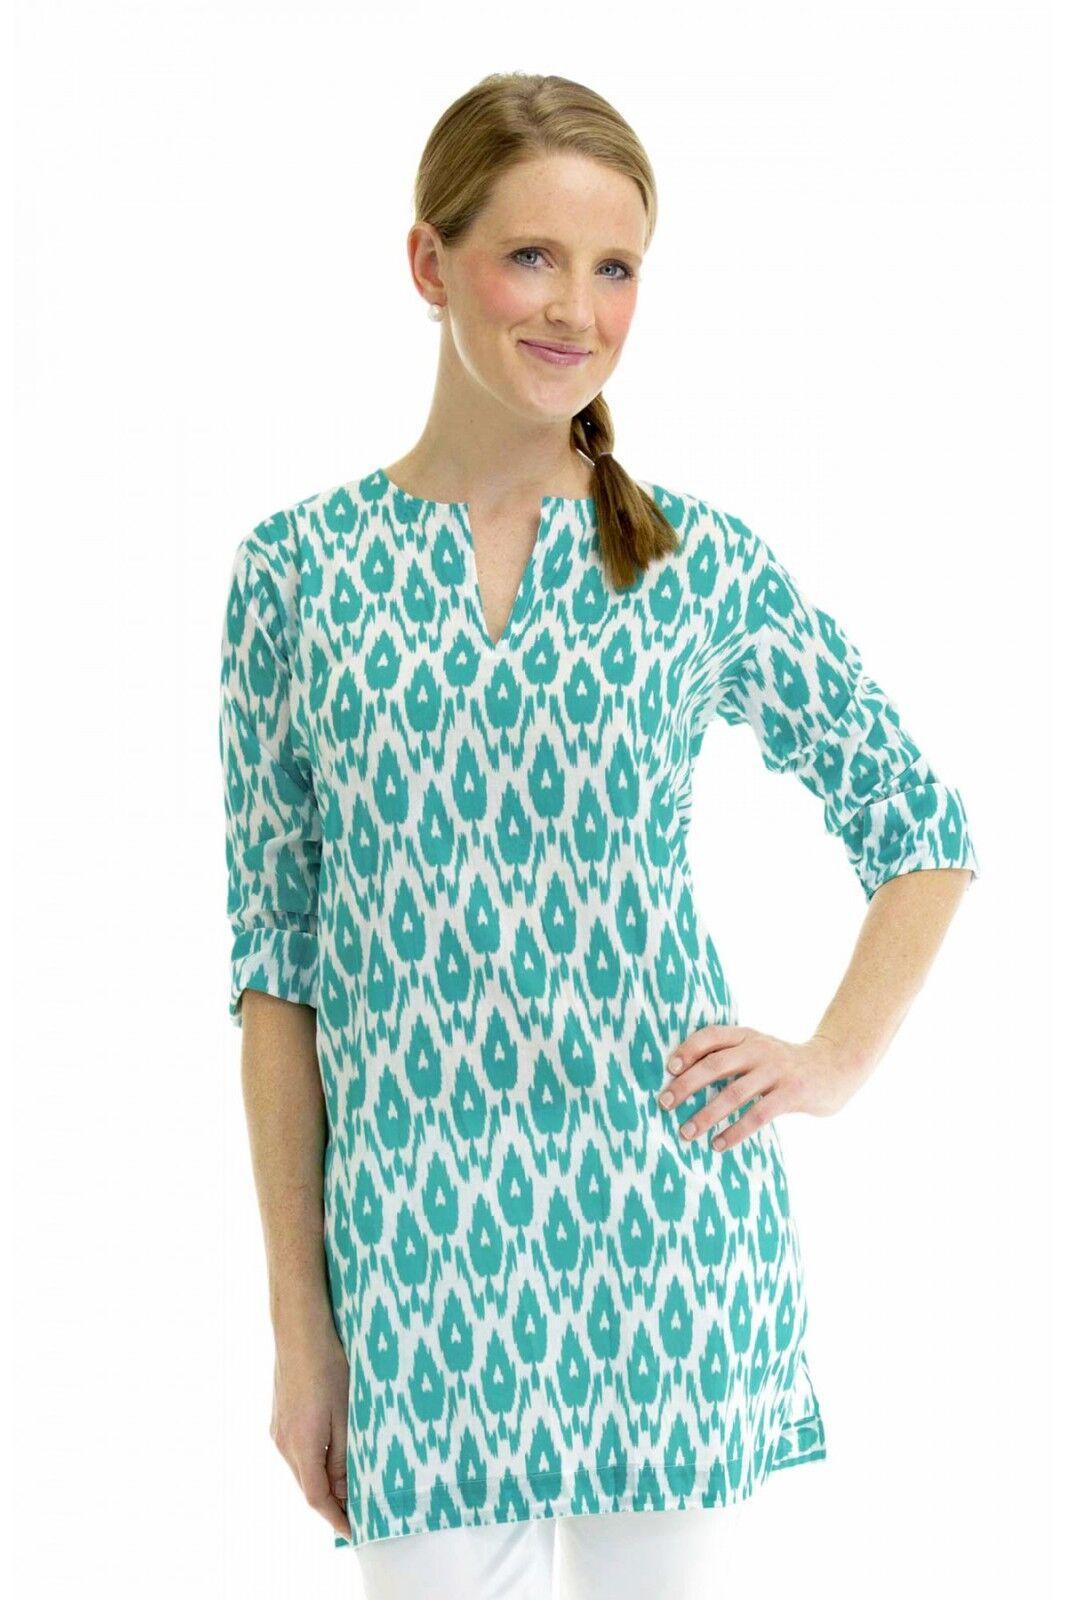 SALE   Gretchen Scott Tunic Turquoise Ikat  Print Tunic  Blouse  Beach Cover